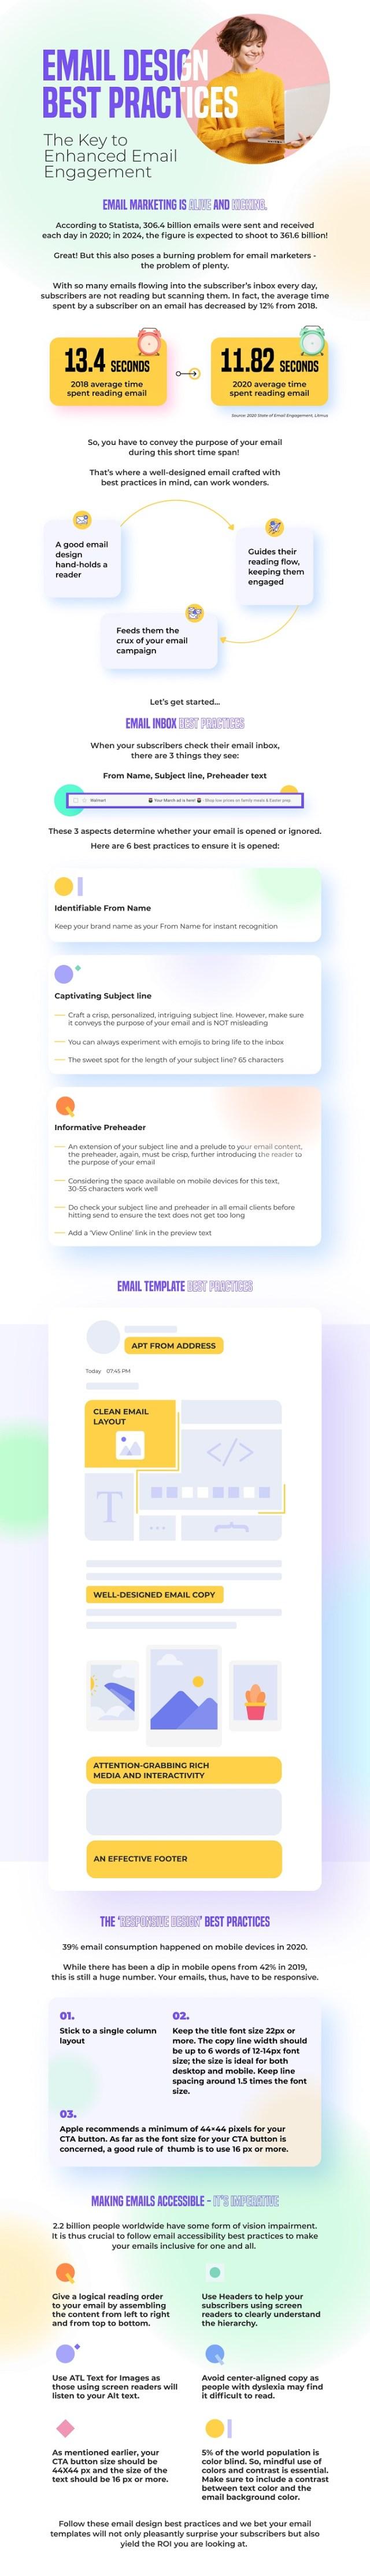 best practice email design 2021 limelightmedia.it